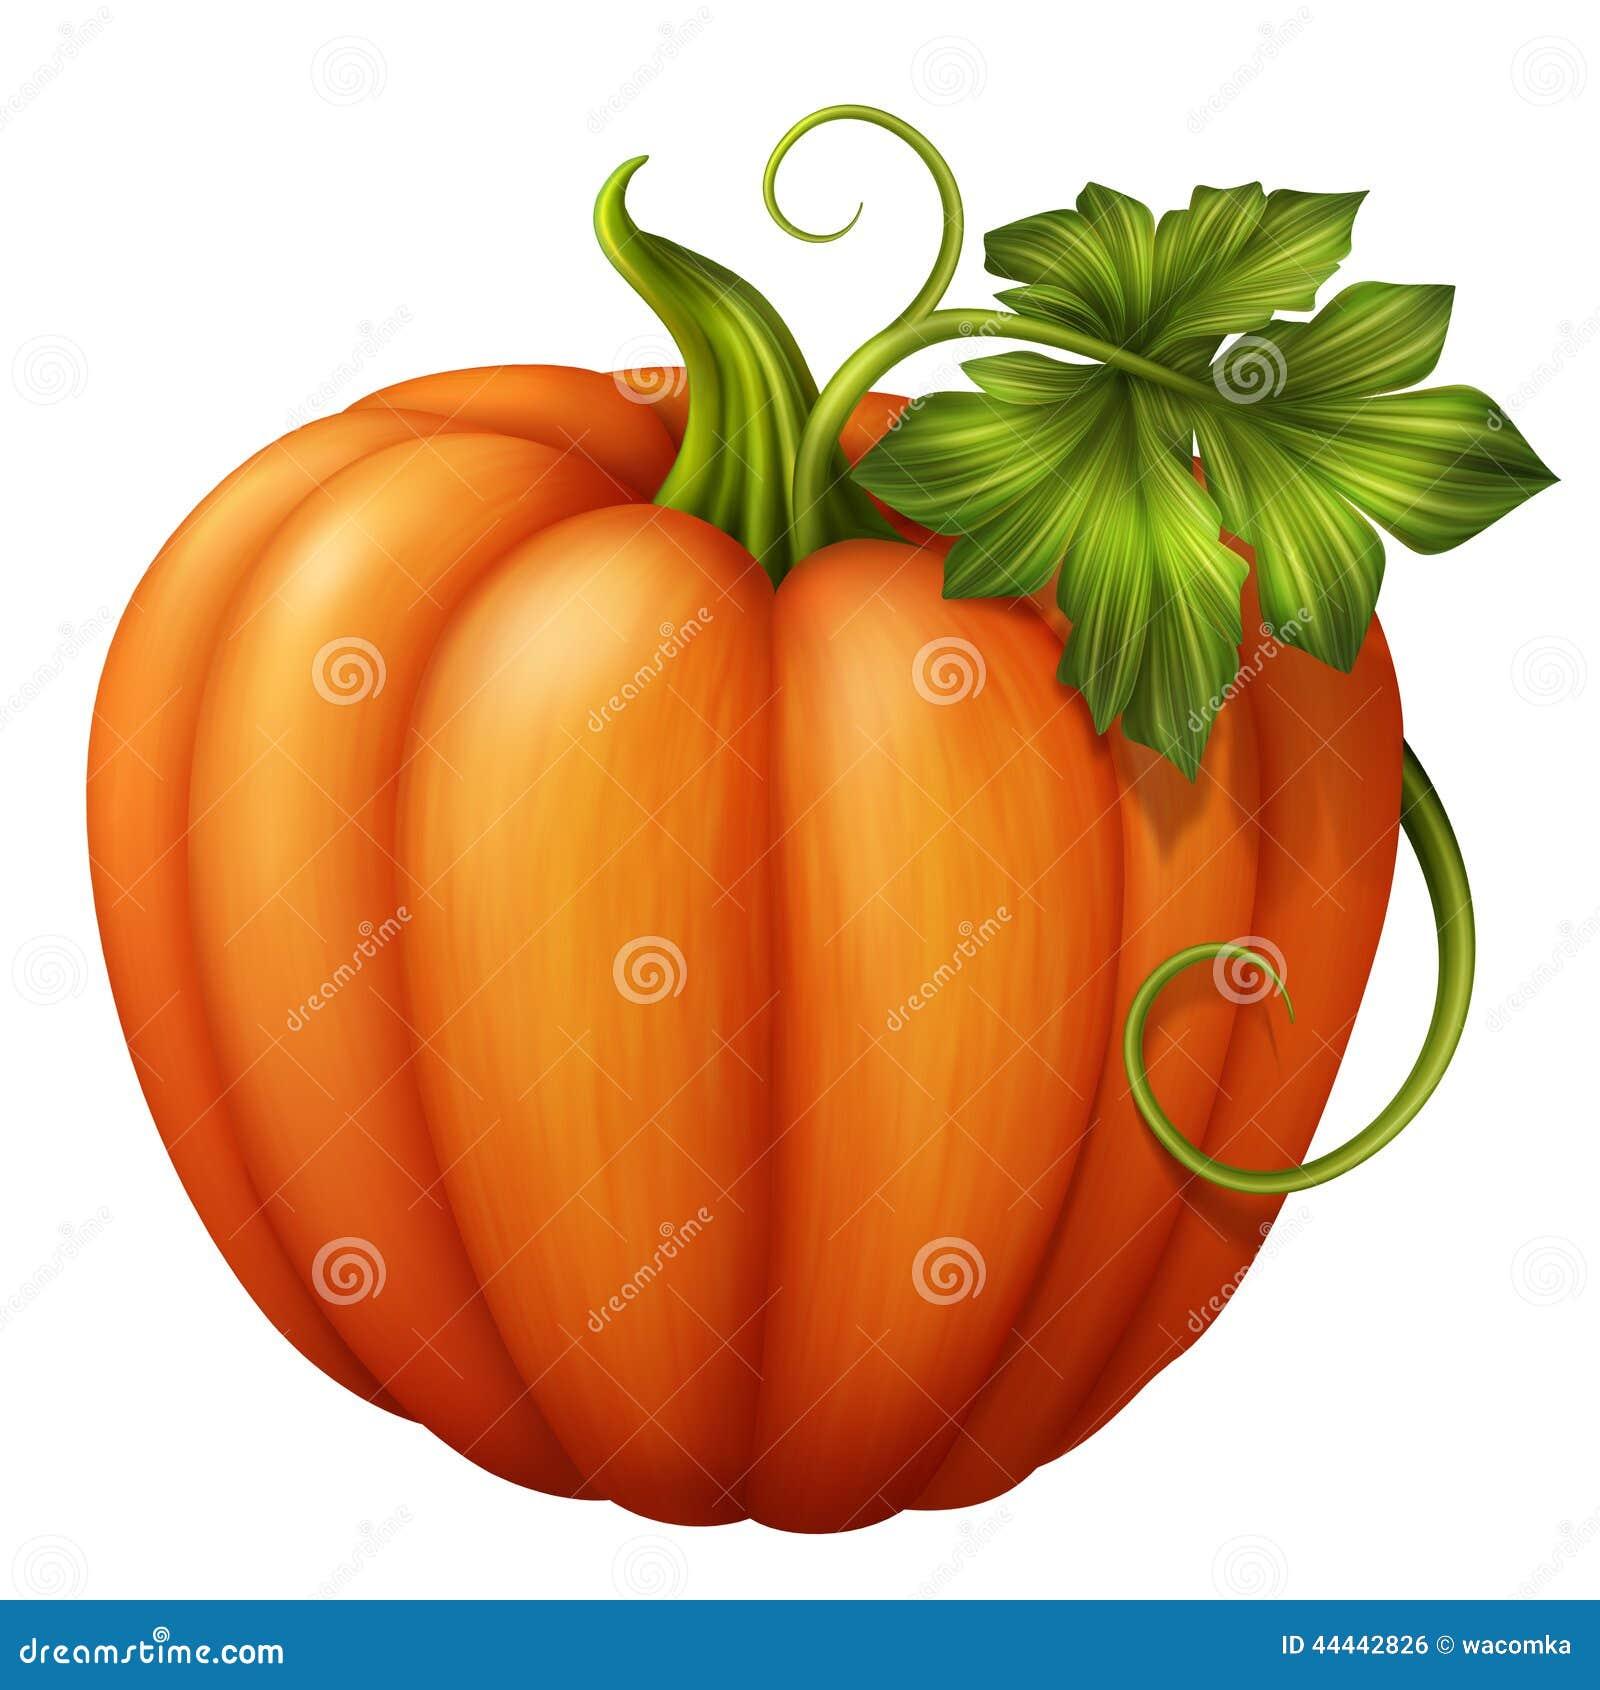 pumpkin heart healthy